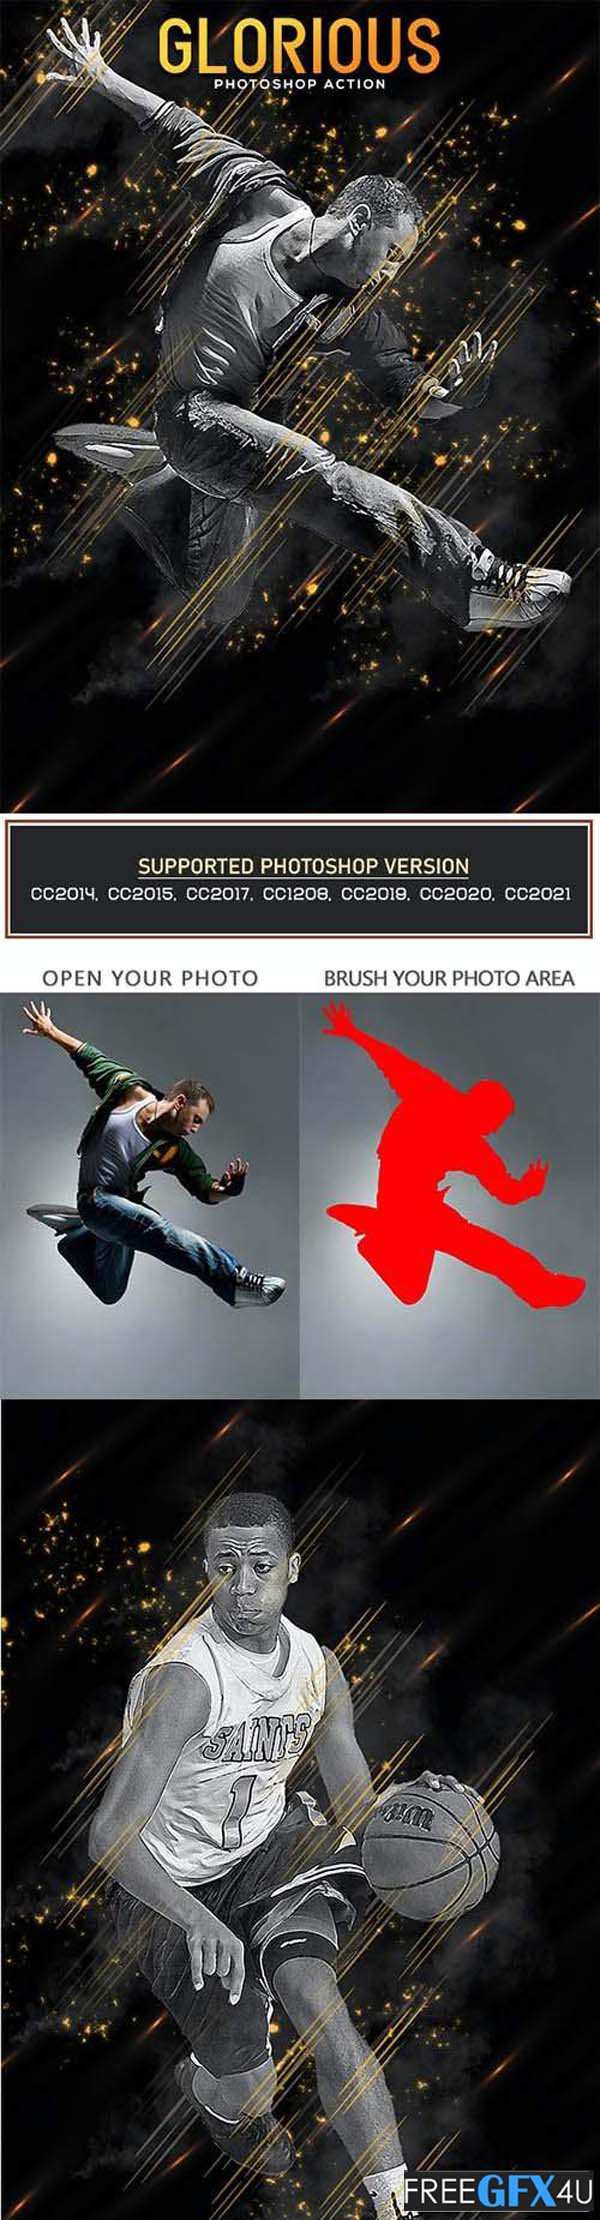 Glorious Photoshop Action